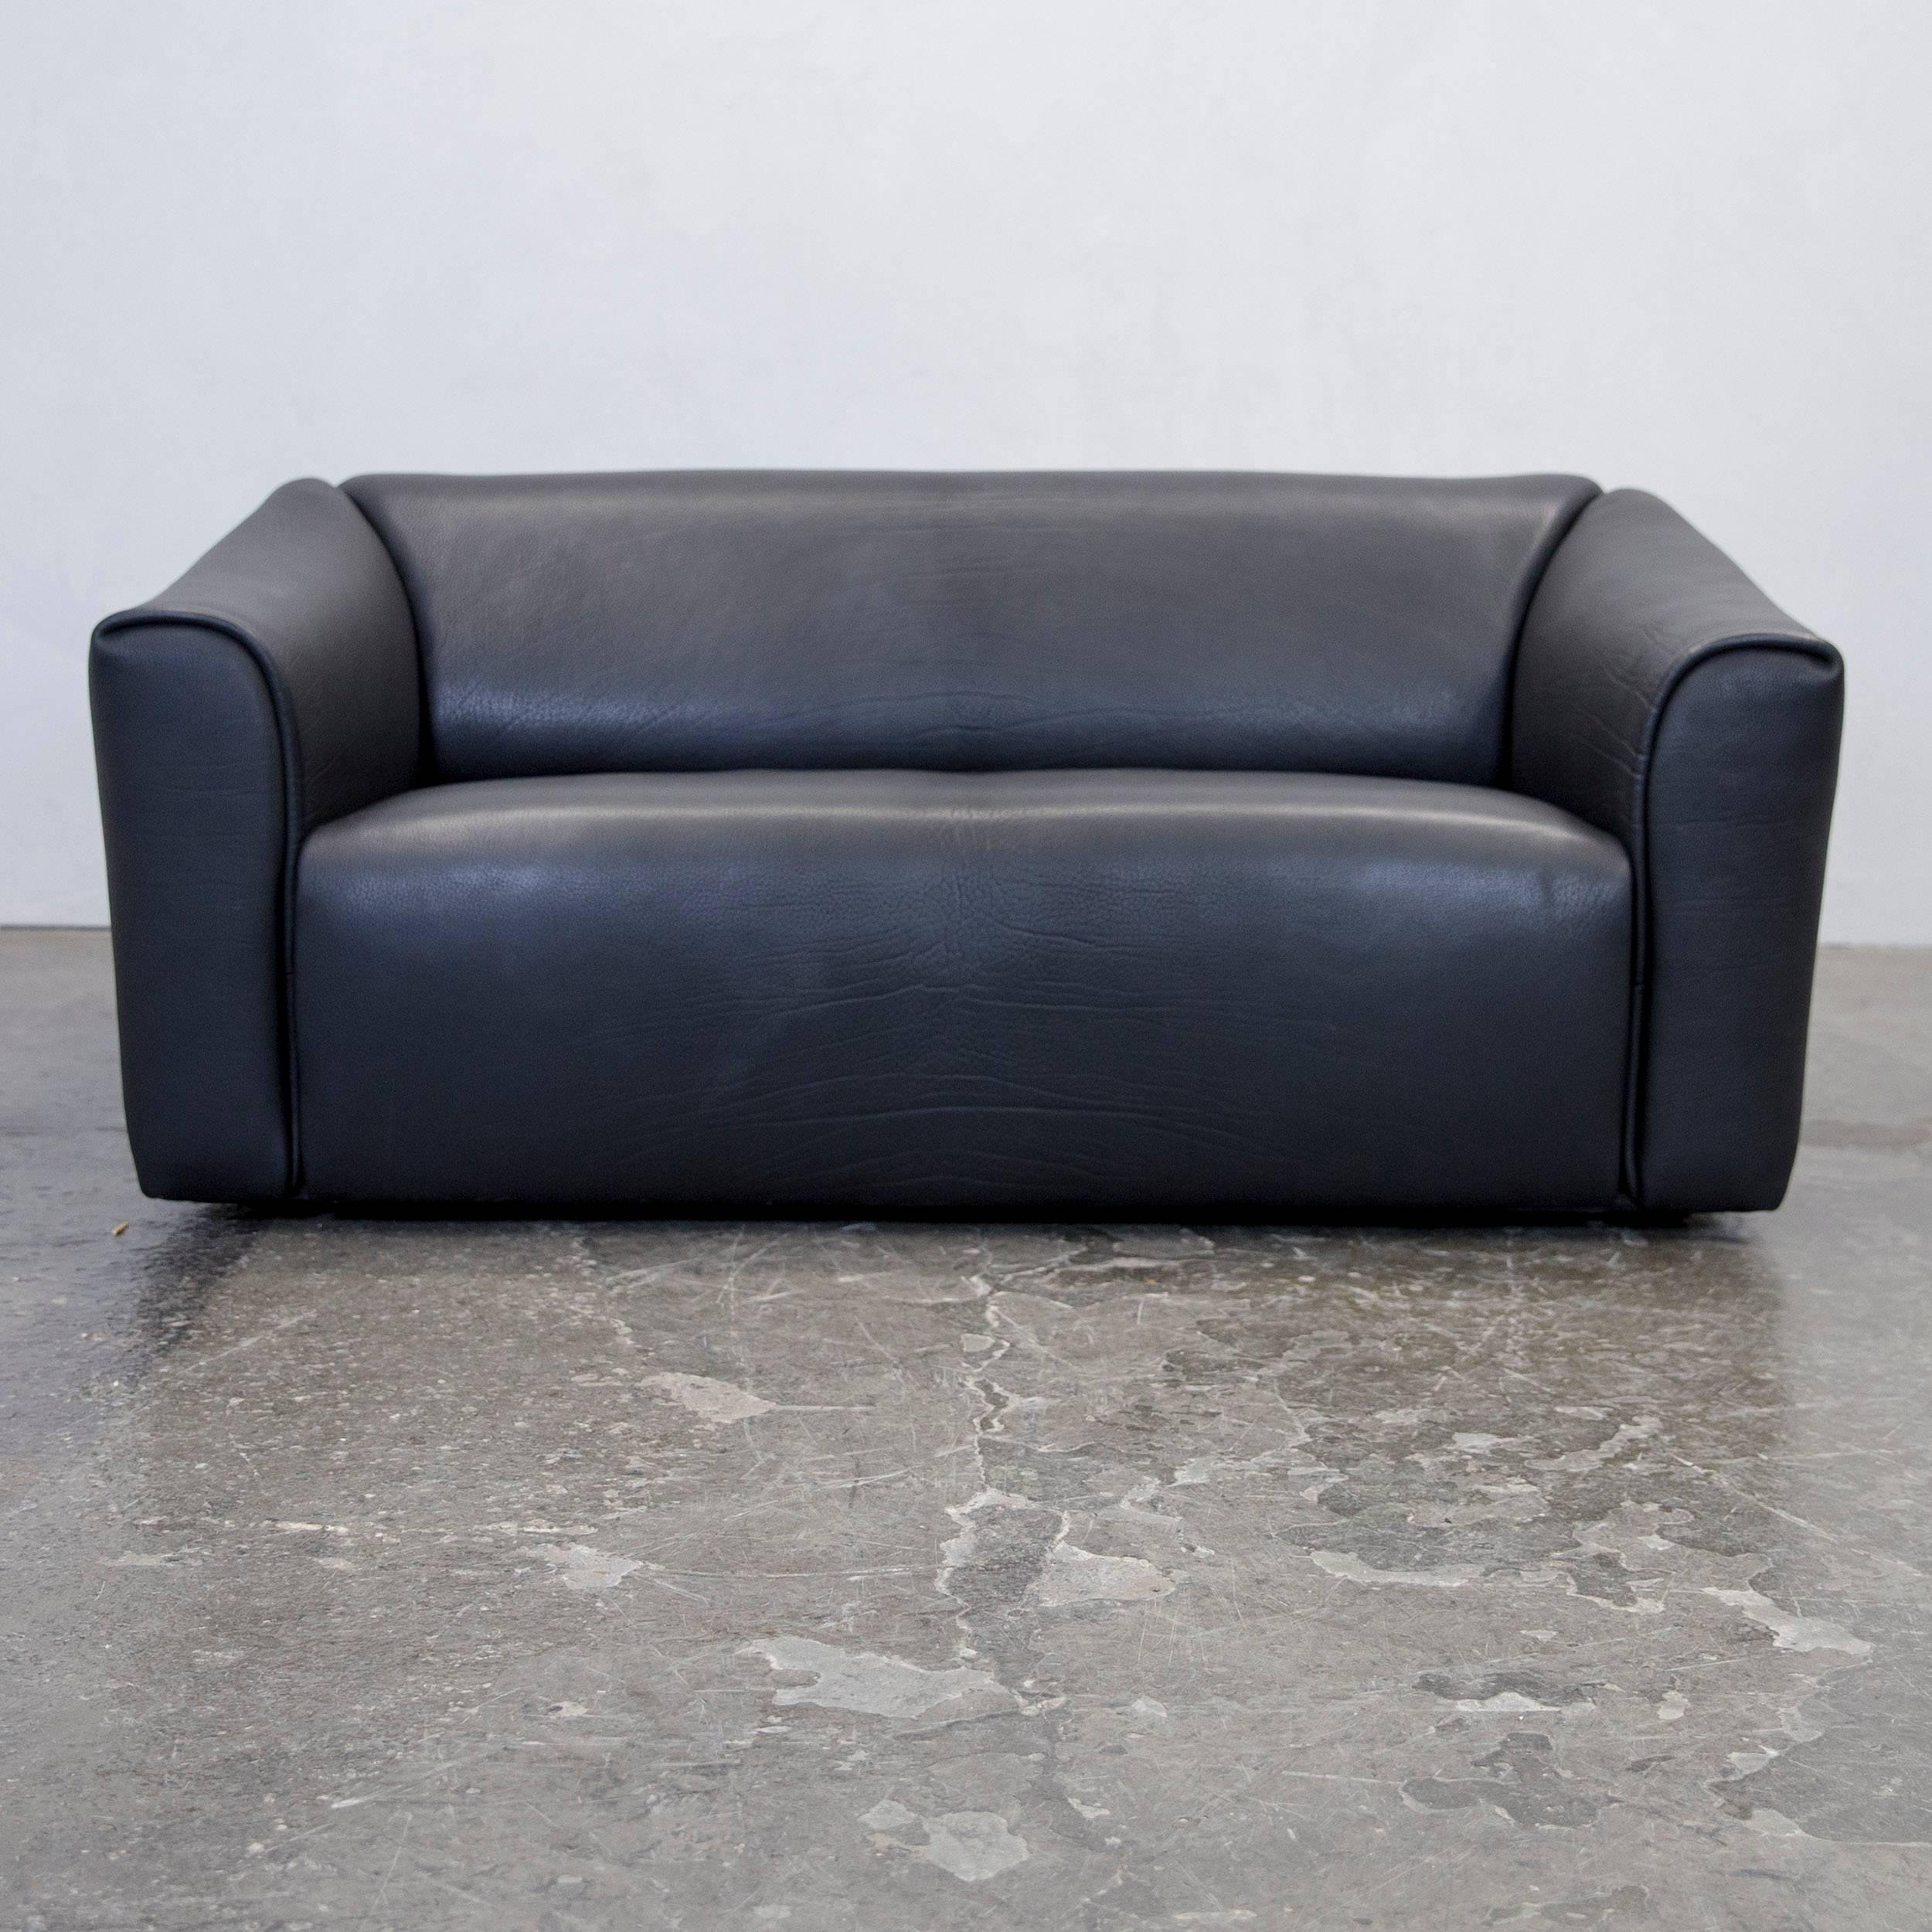 zweisitzer couch trendy sessel sofas luxury cor designer sofa garnitur anthrazit grau leder. Black Bedroom Furniture Sets. Home Design Ideas